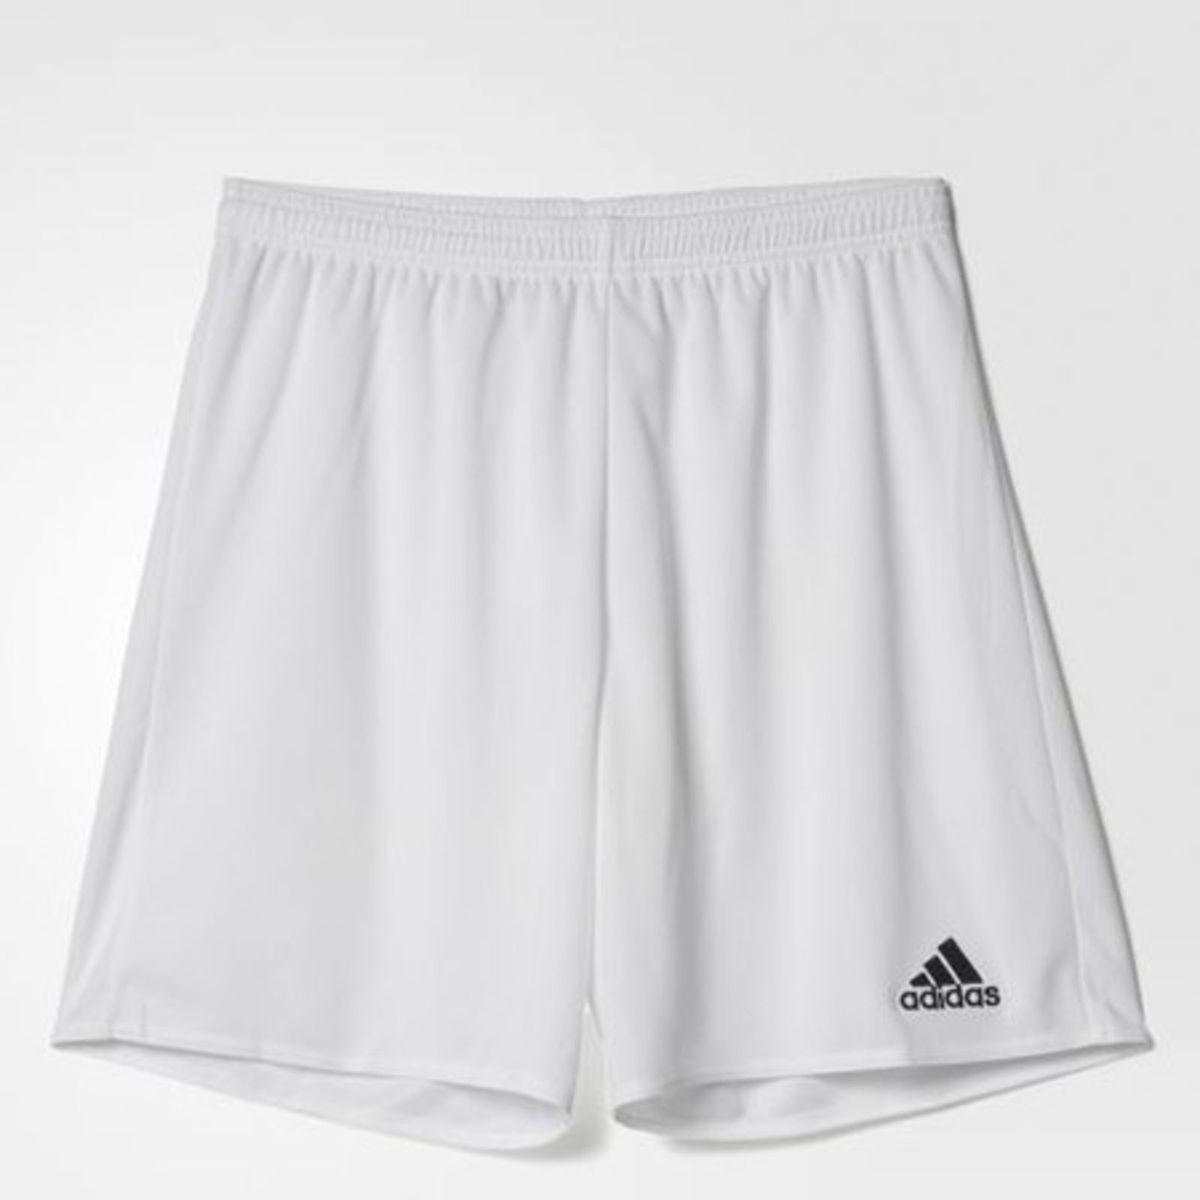 short parma adidas - branco - bermudas adidas.  Czm6ly9wag90b3muzw5qb2vplmnvbs5ici9wcm9kdwn0cy82nje3ntuxlzhhmwvlnwyxyme2mdi5mdc4yjzkytq1zme5ndqzn2q0lmpwzw  ... ebe075956d0af